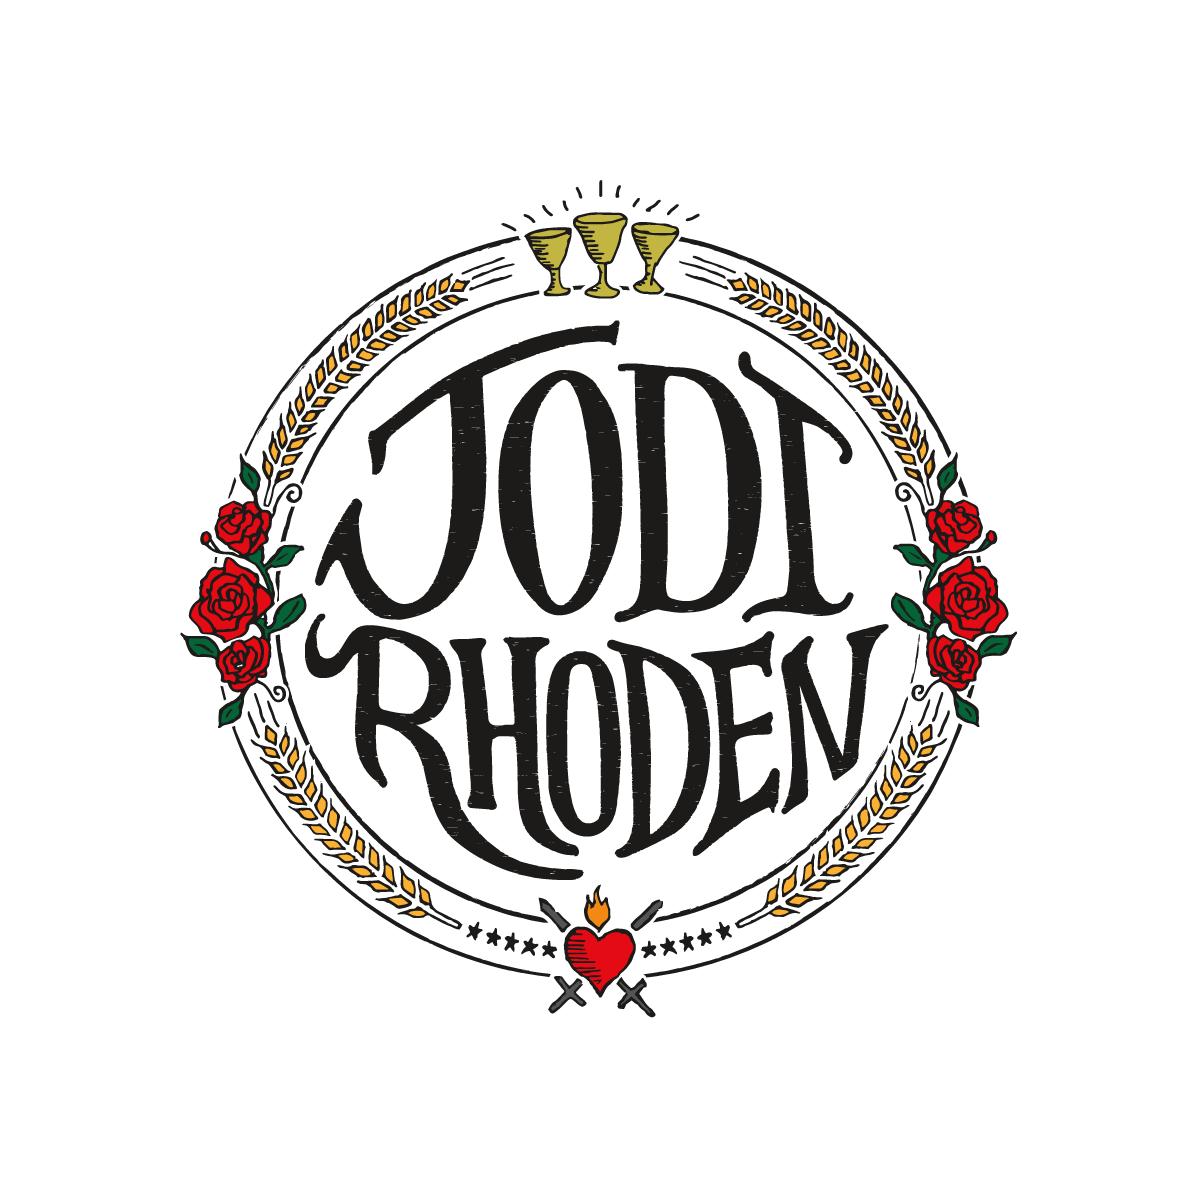 Jodi Rhoden Logo